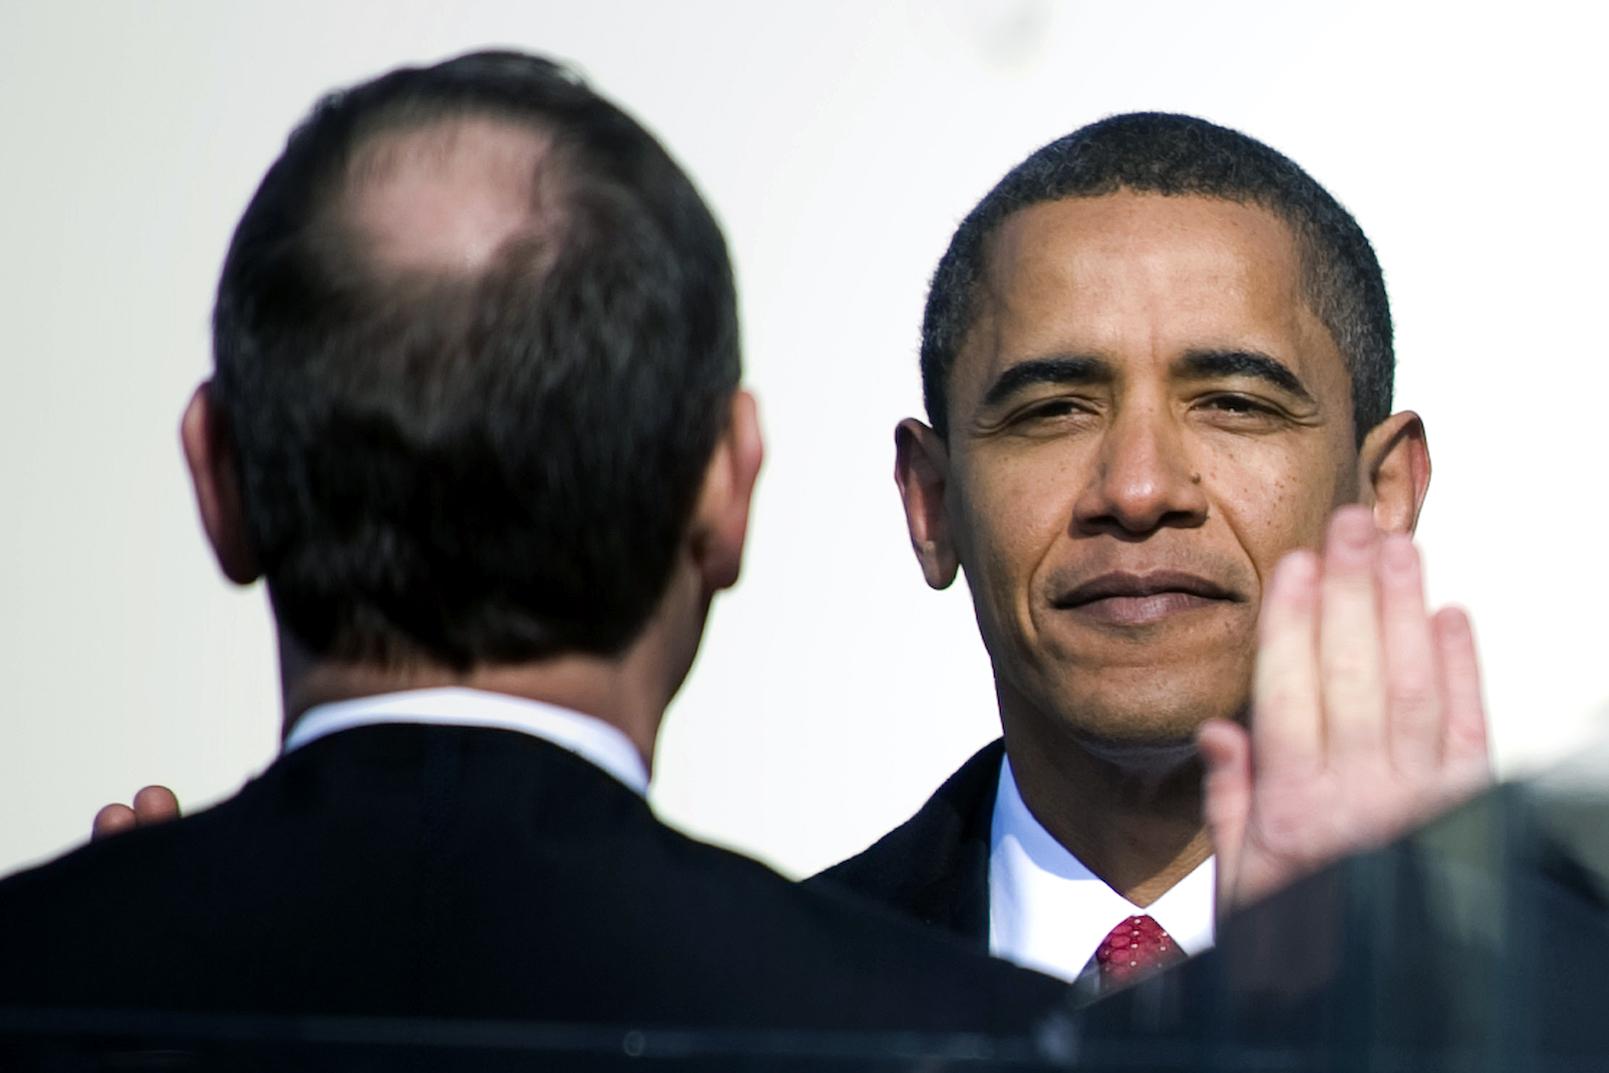 Photo credit: defense.gov